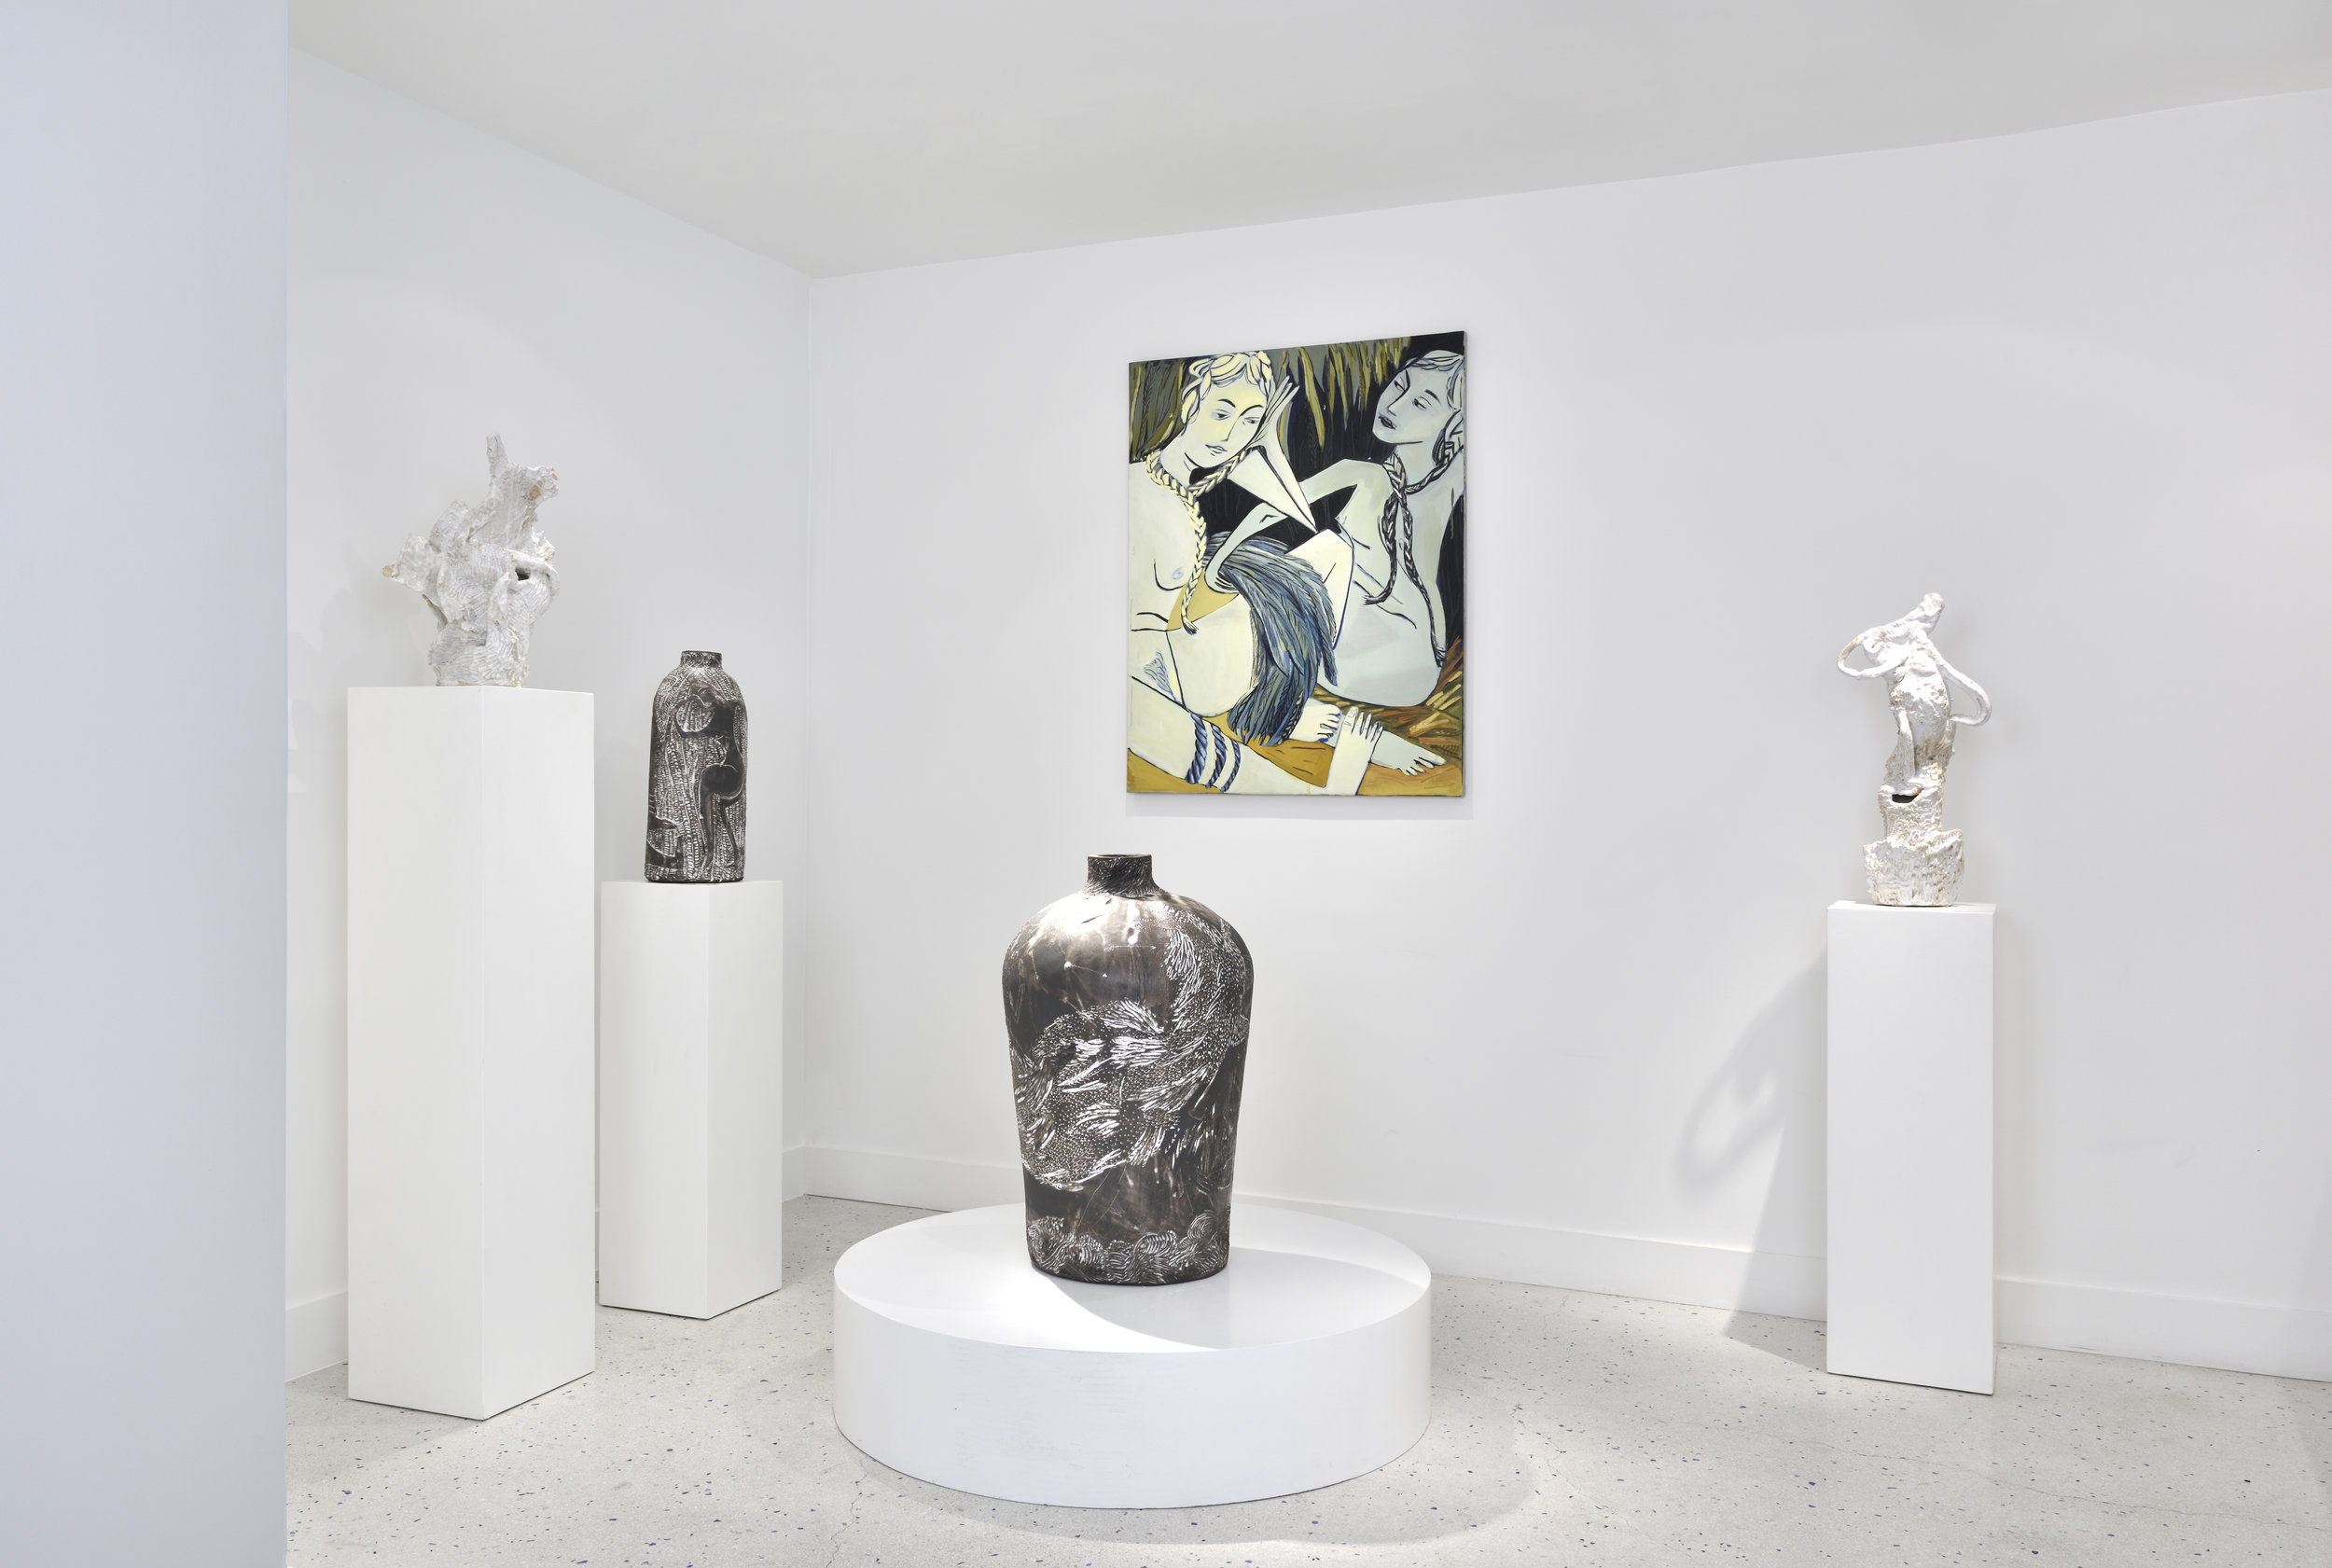 Installation View,  Fountain ,Galerie Lefebvre et Fils, Paris, France, 2017. Photo by Rebecca Fanuele.